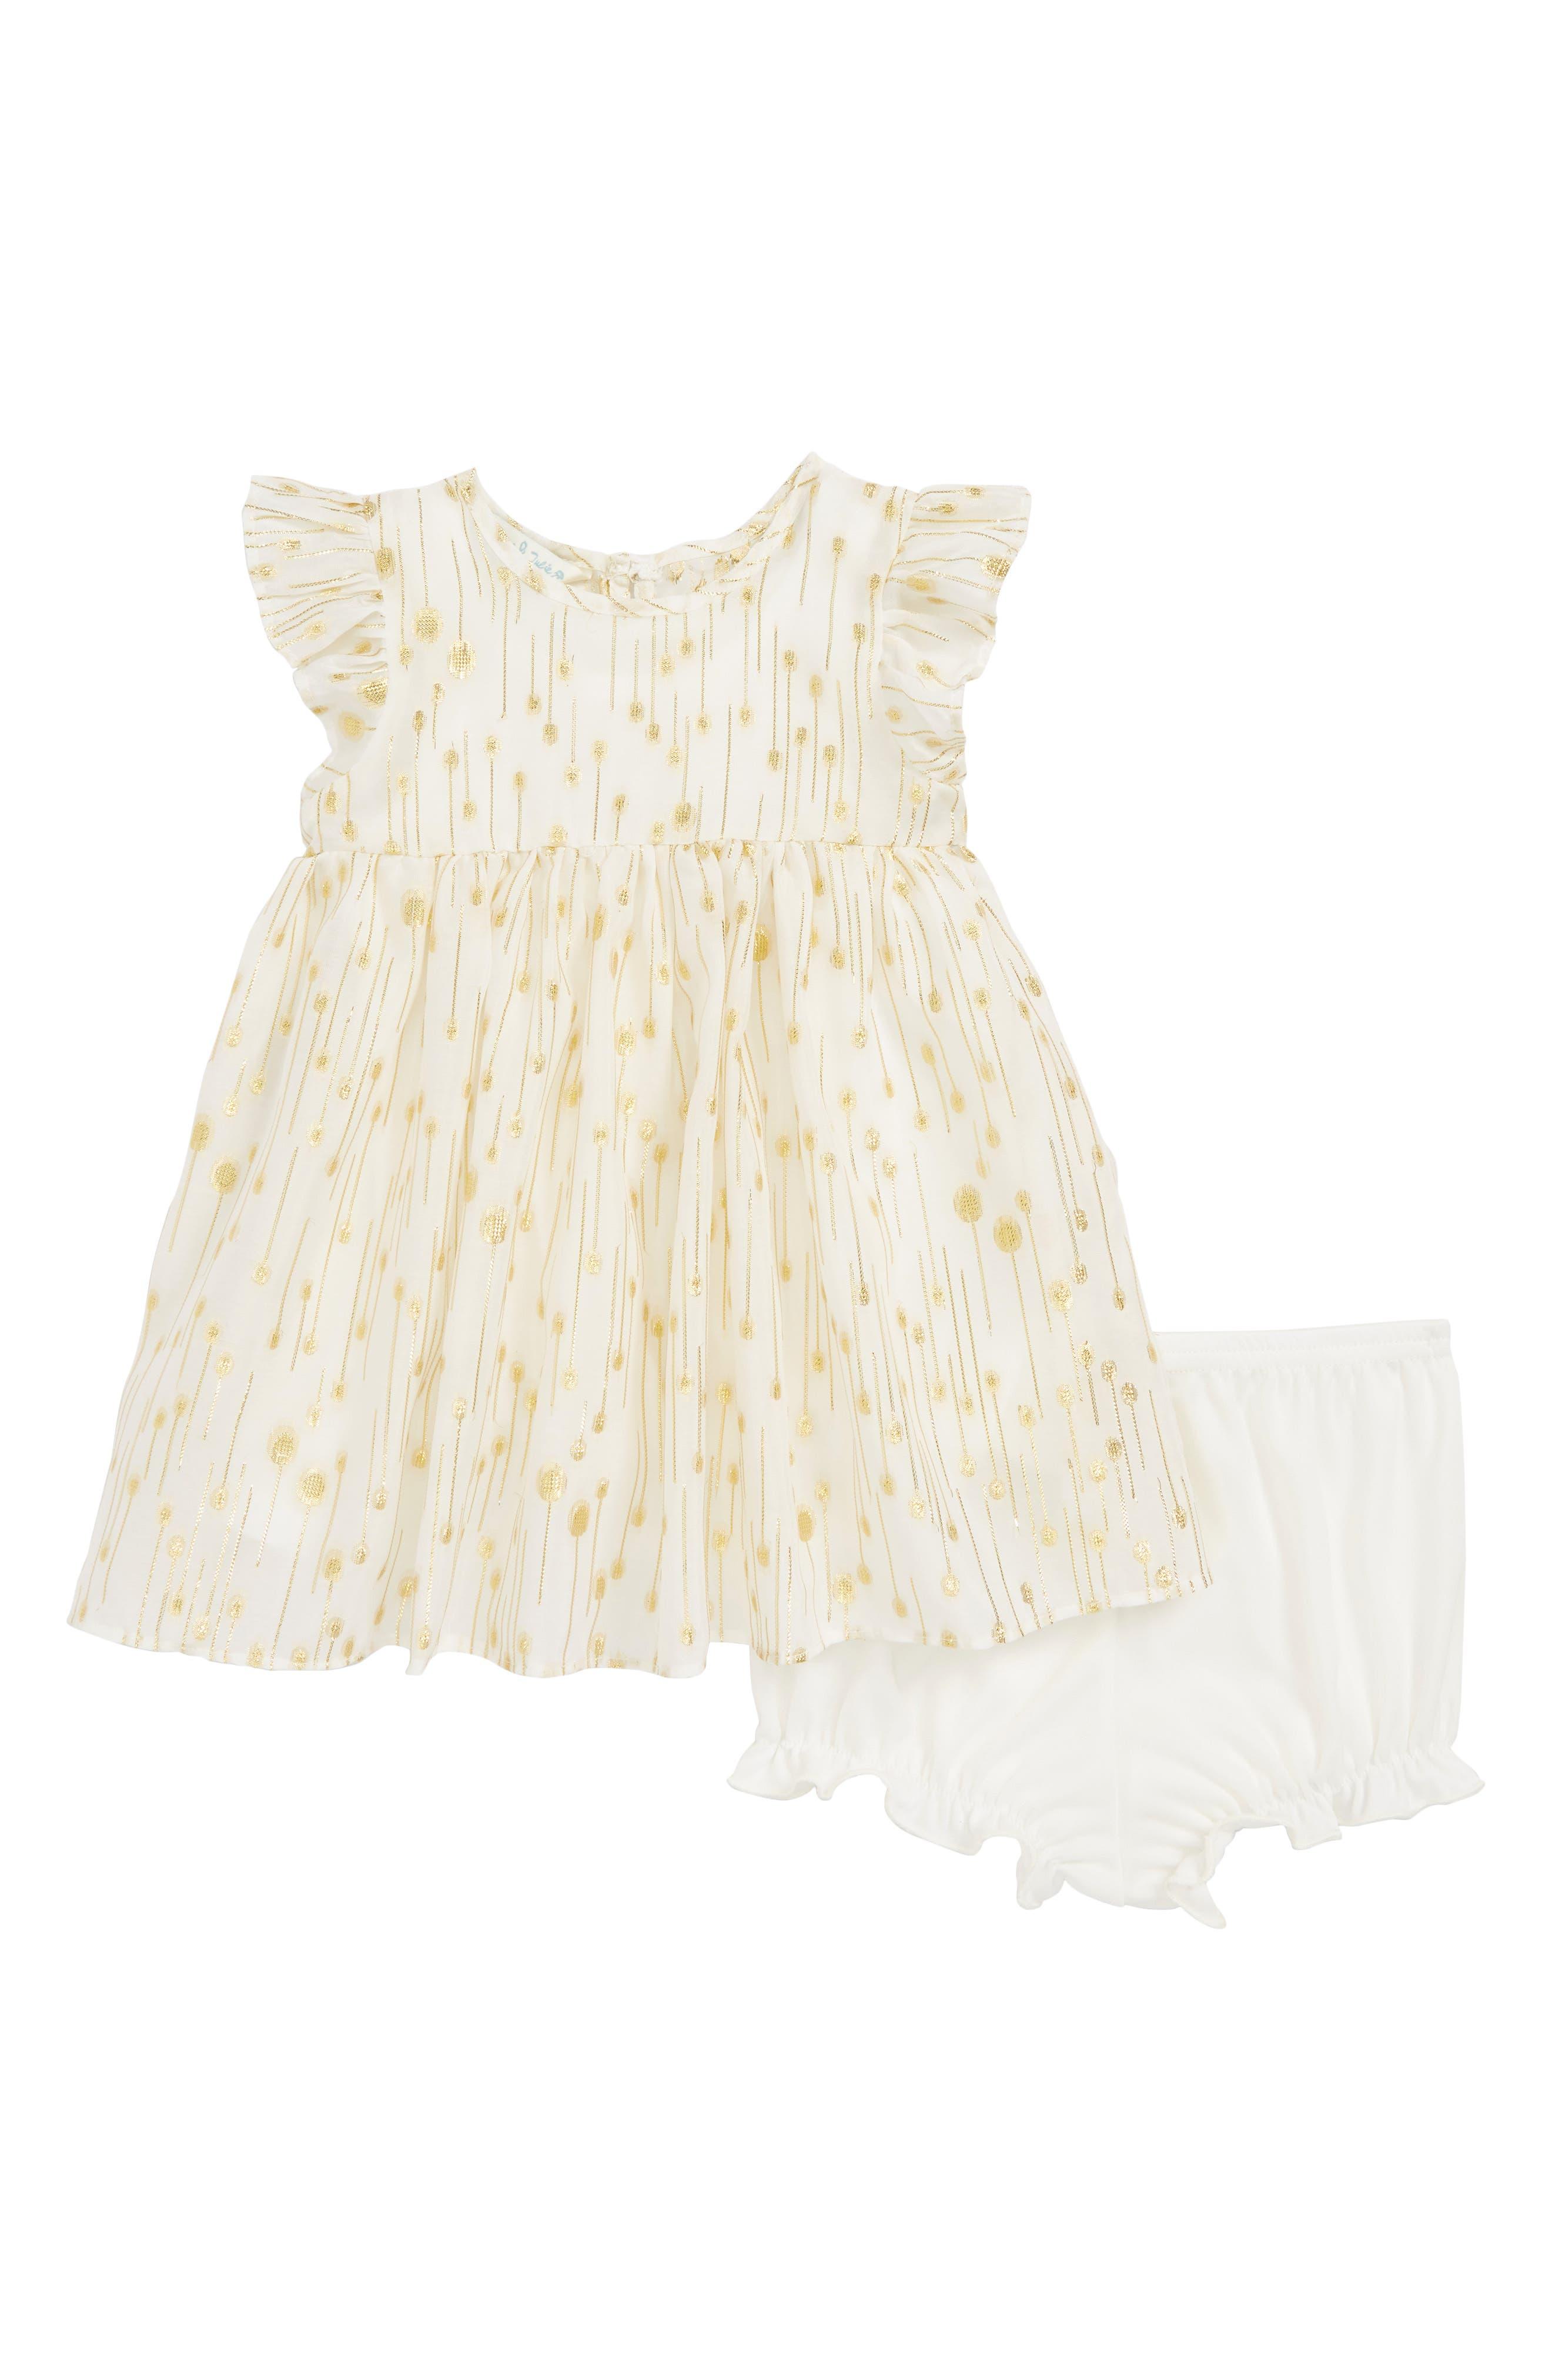 Flutter Sleeve Dress,                             Main thumbnail 1, color,                             IVORY / GOLD